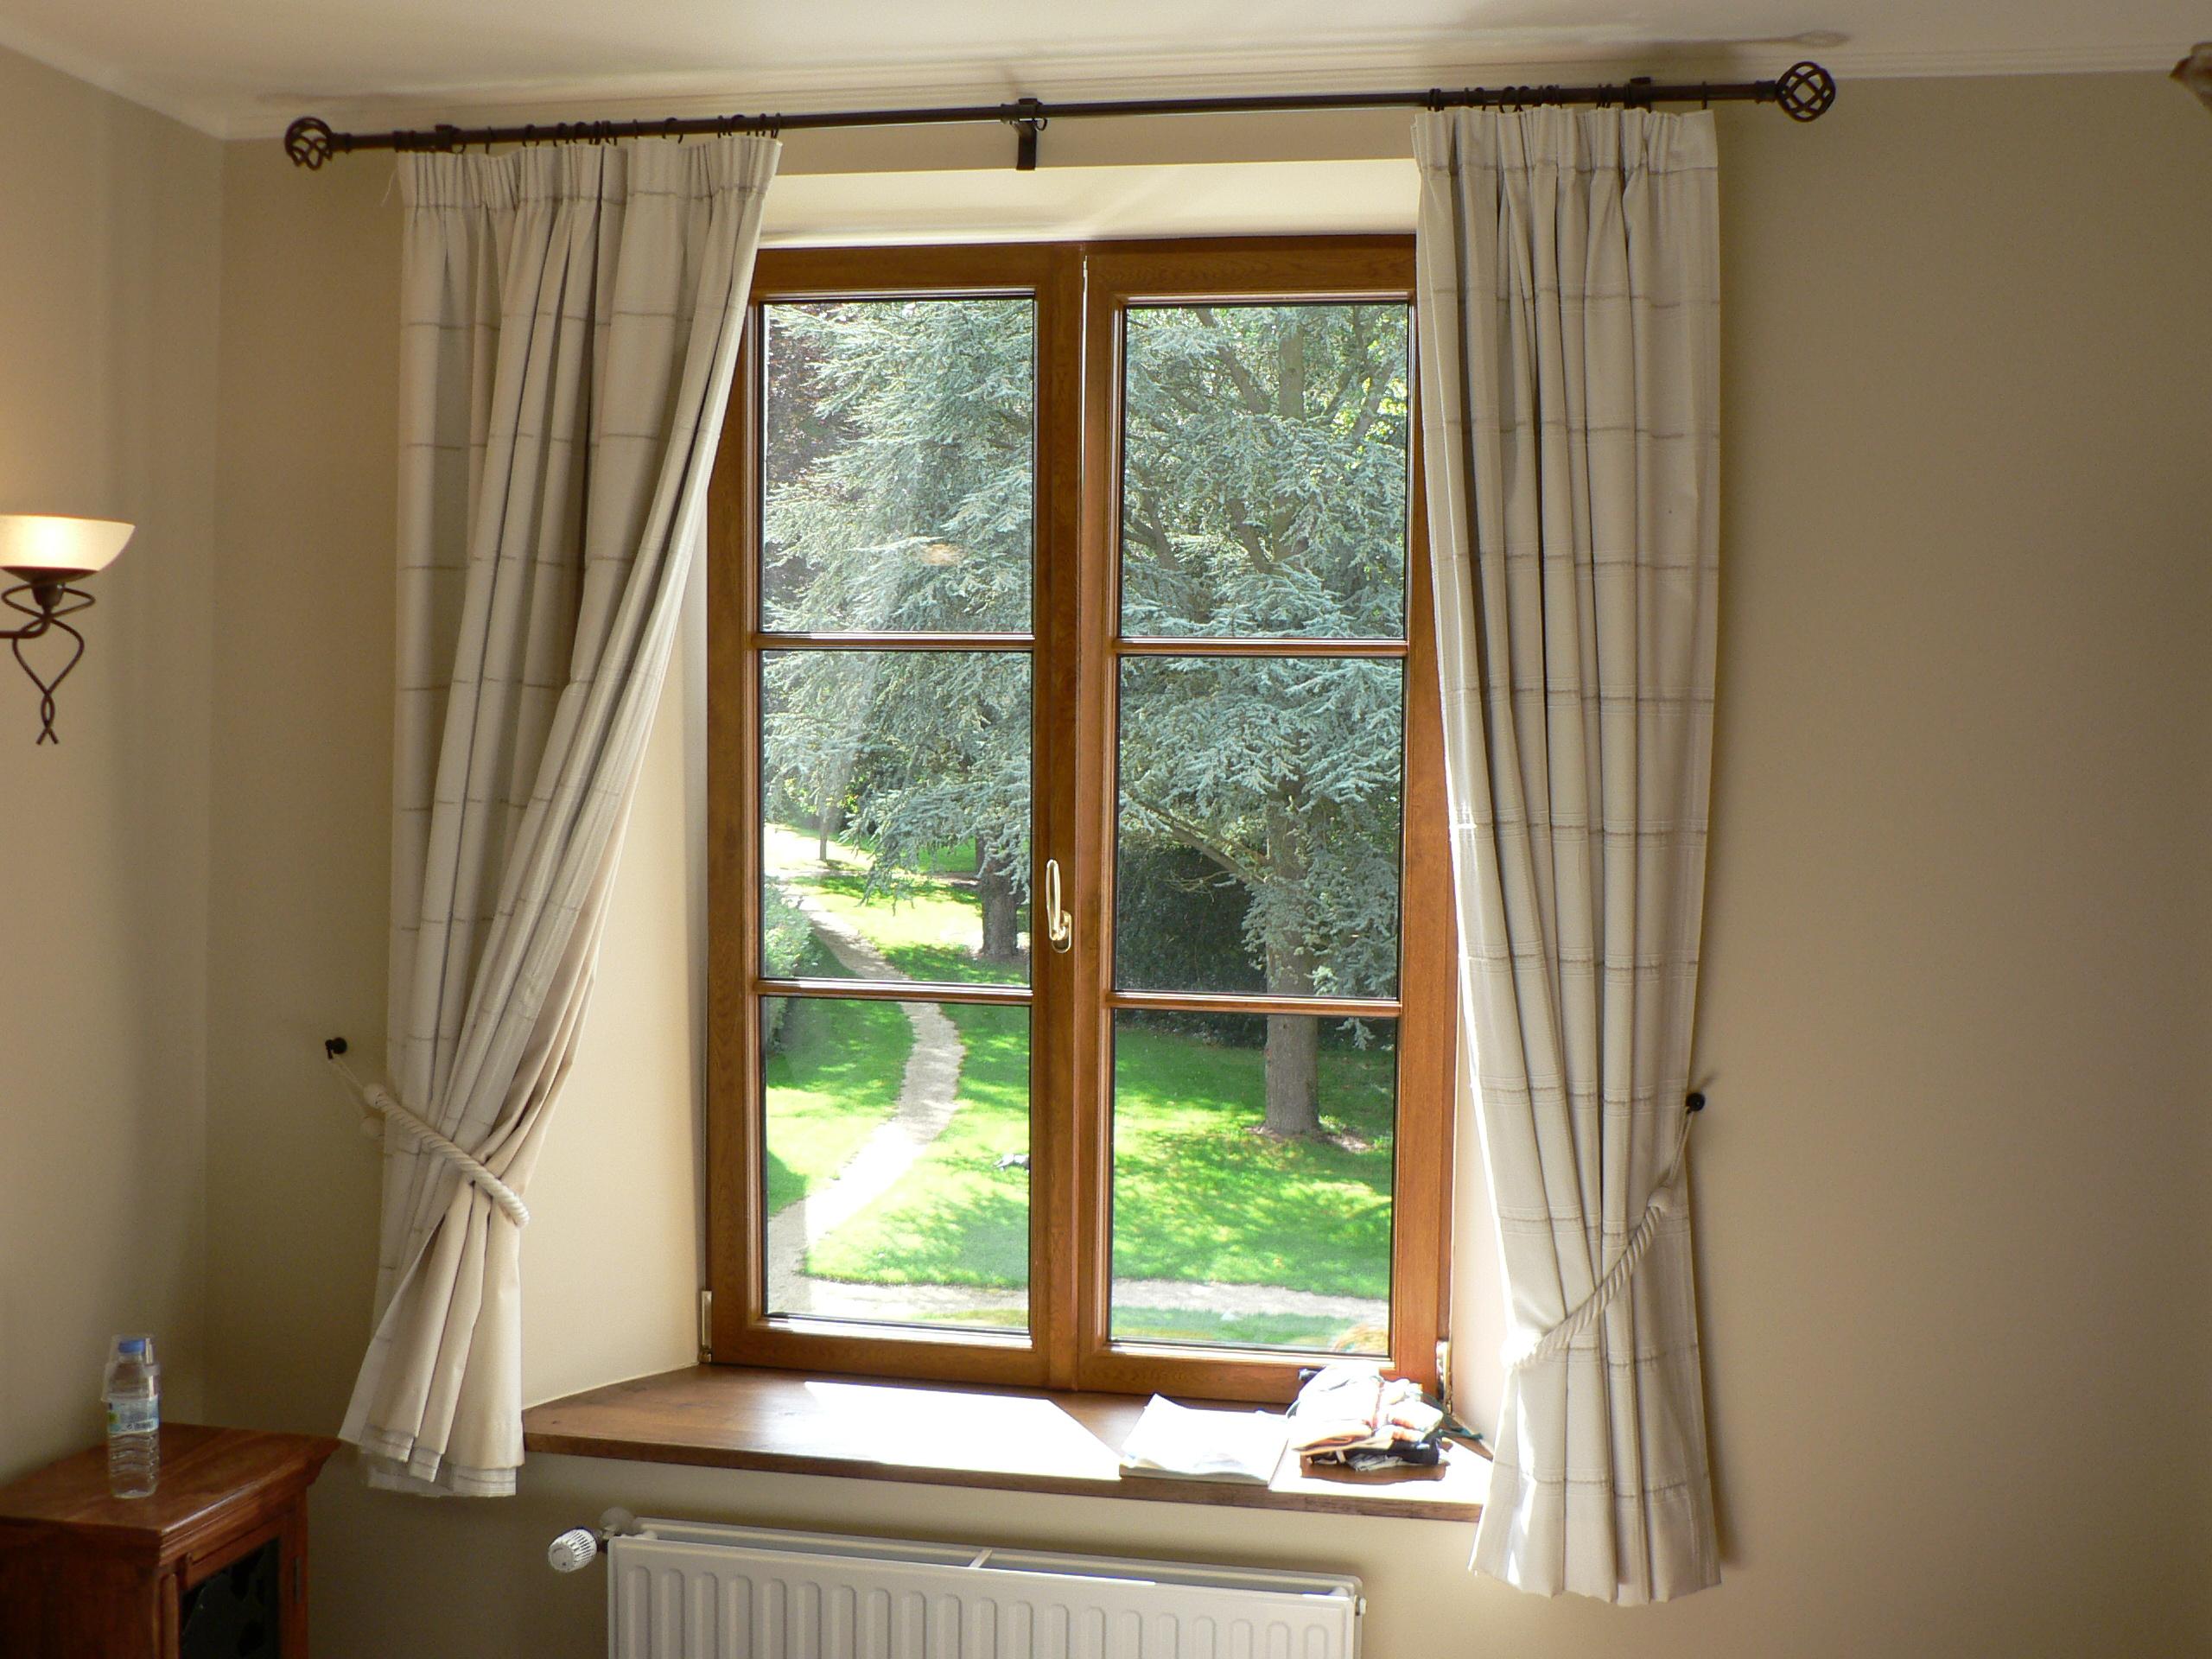 Casement window types - Casement Window Types